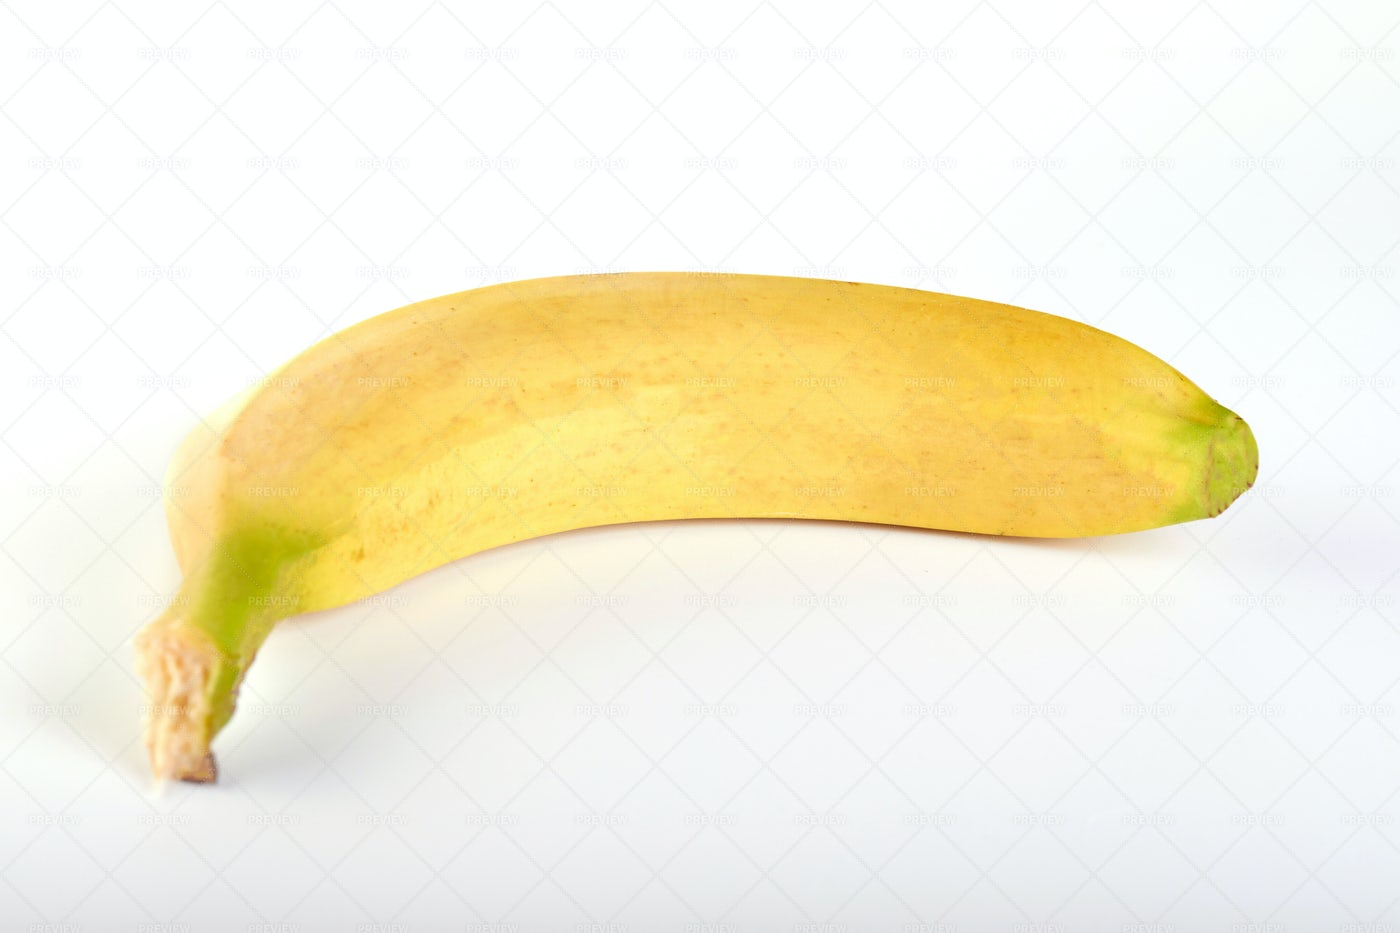 Single Banana On White: Stock Photos